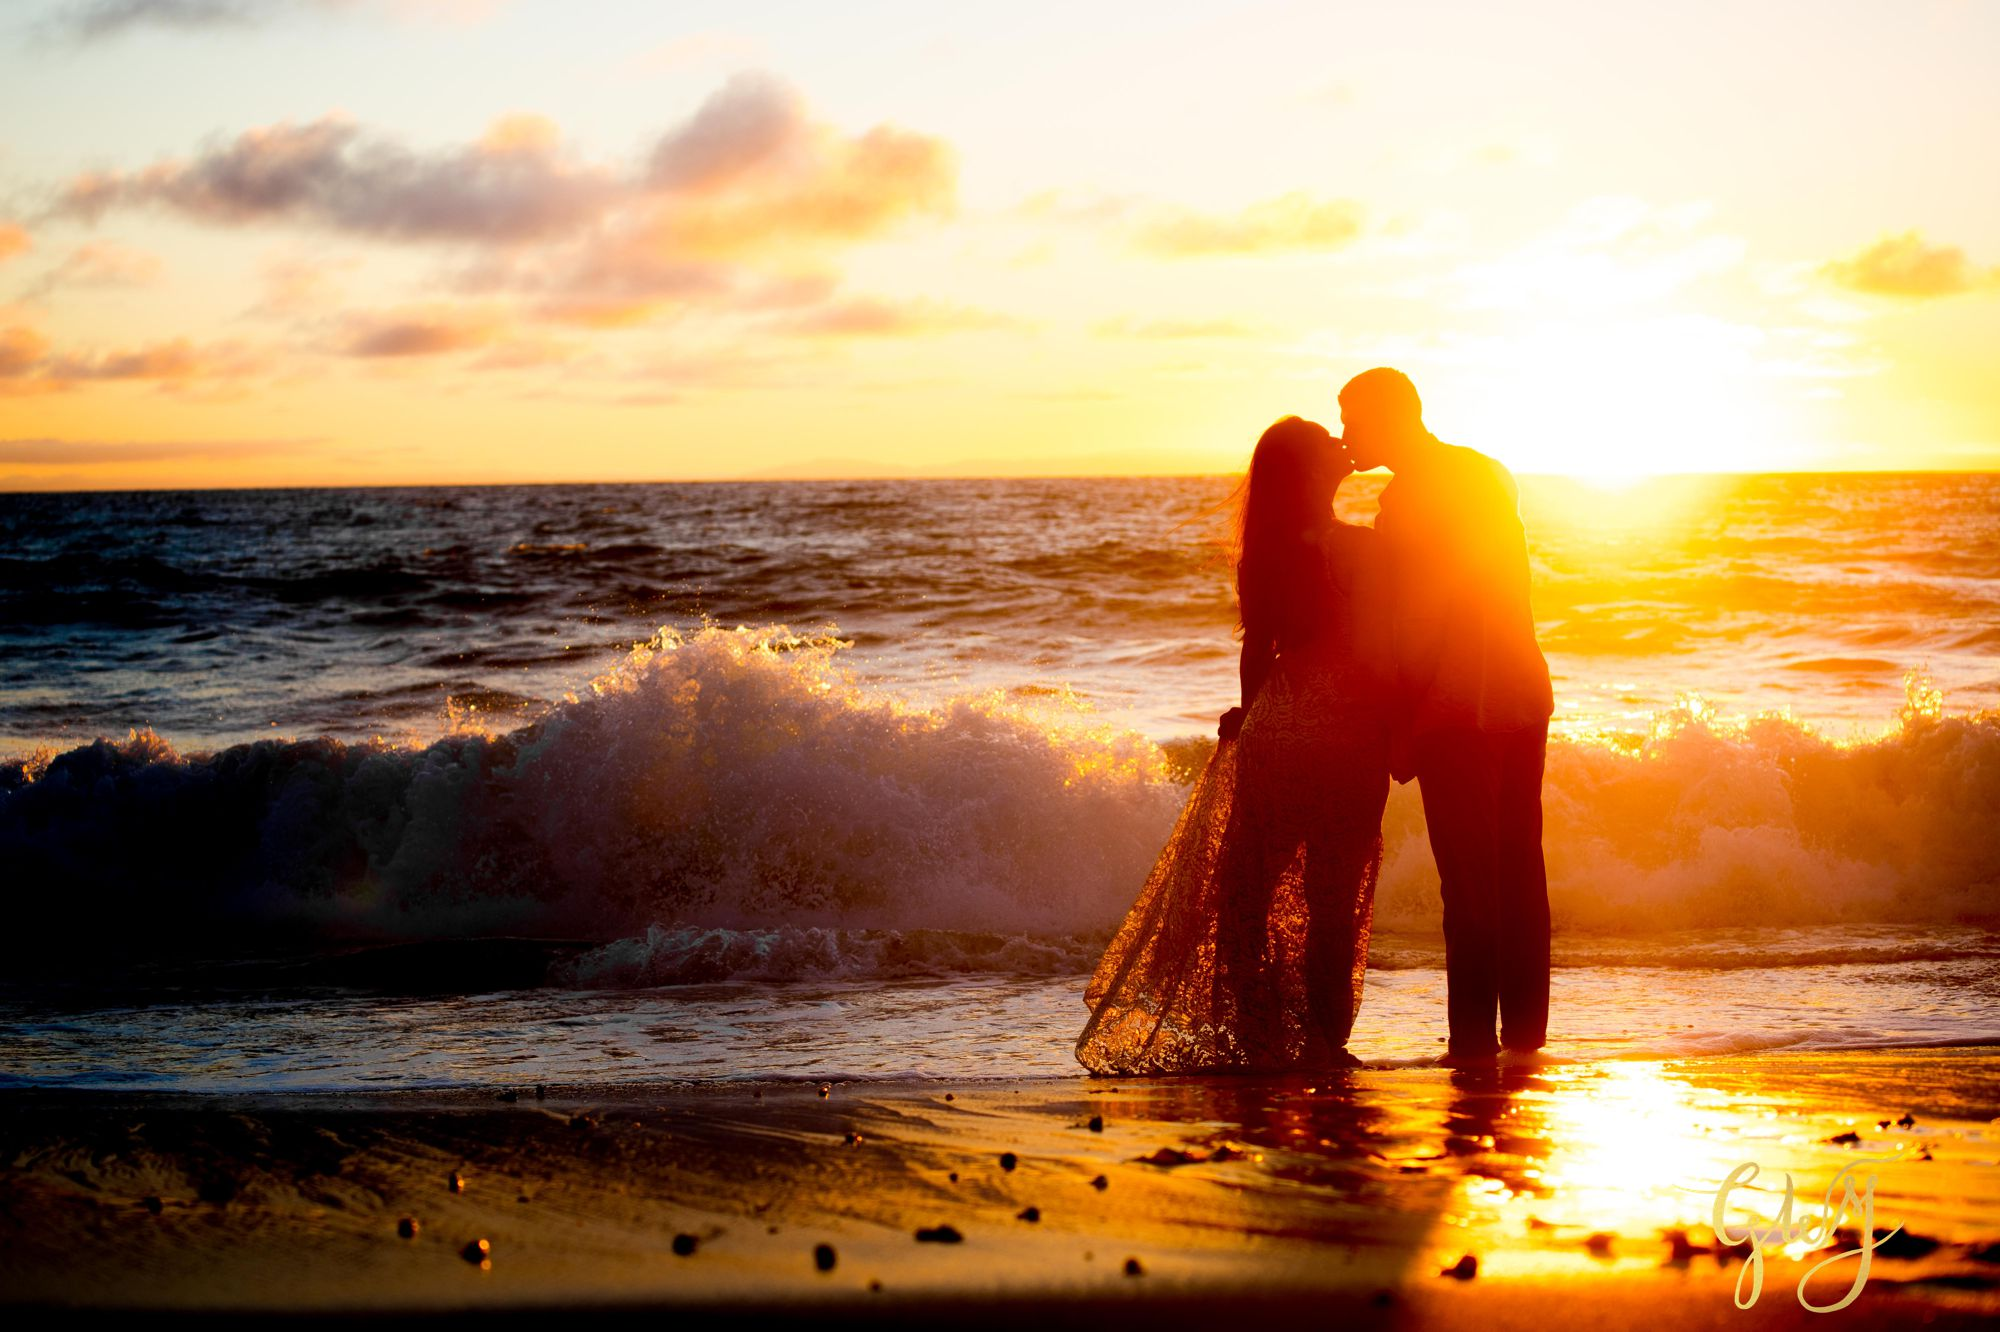 Alejandro + Rachel Mission San Juan Capistrano Strands Beach Dana Point Sunset Engagement by Glass Woods Media 17.jpg